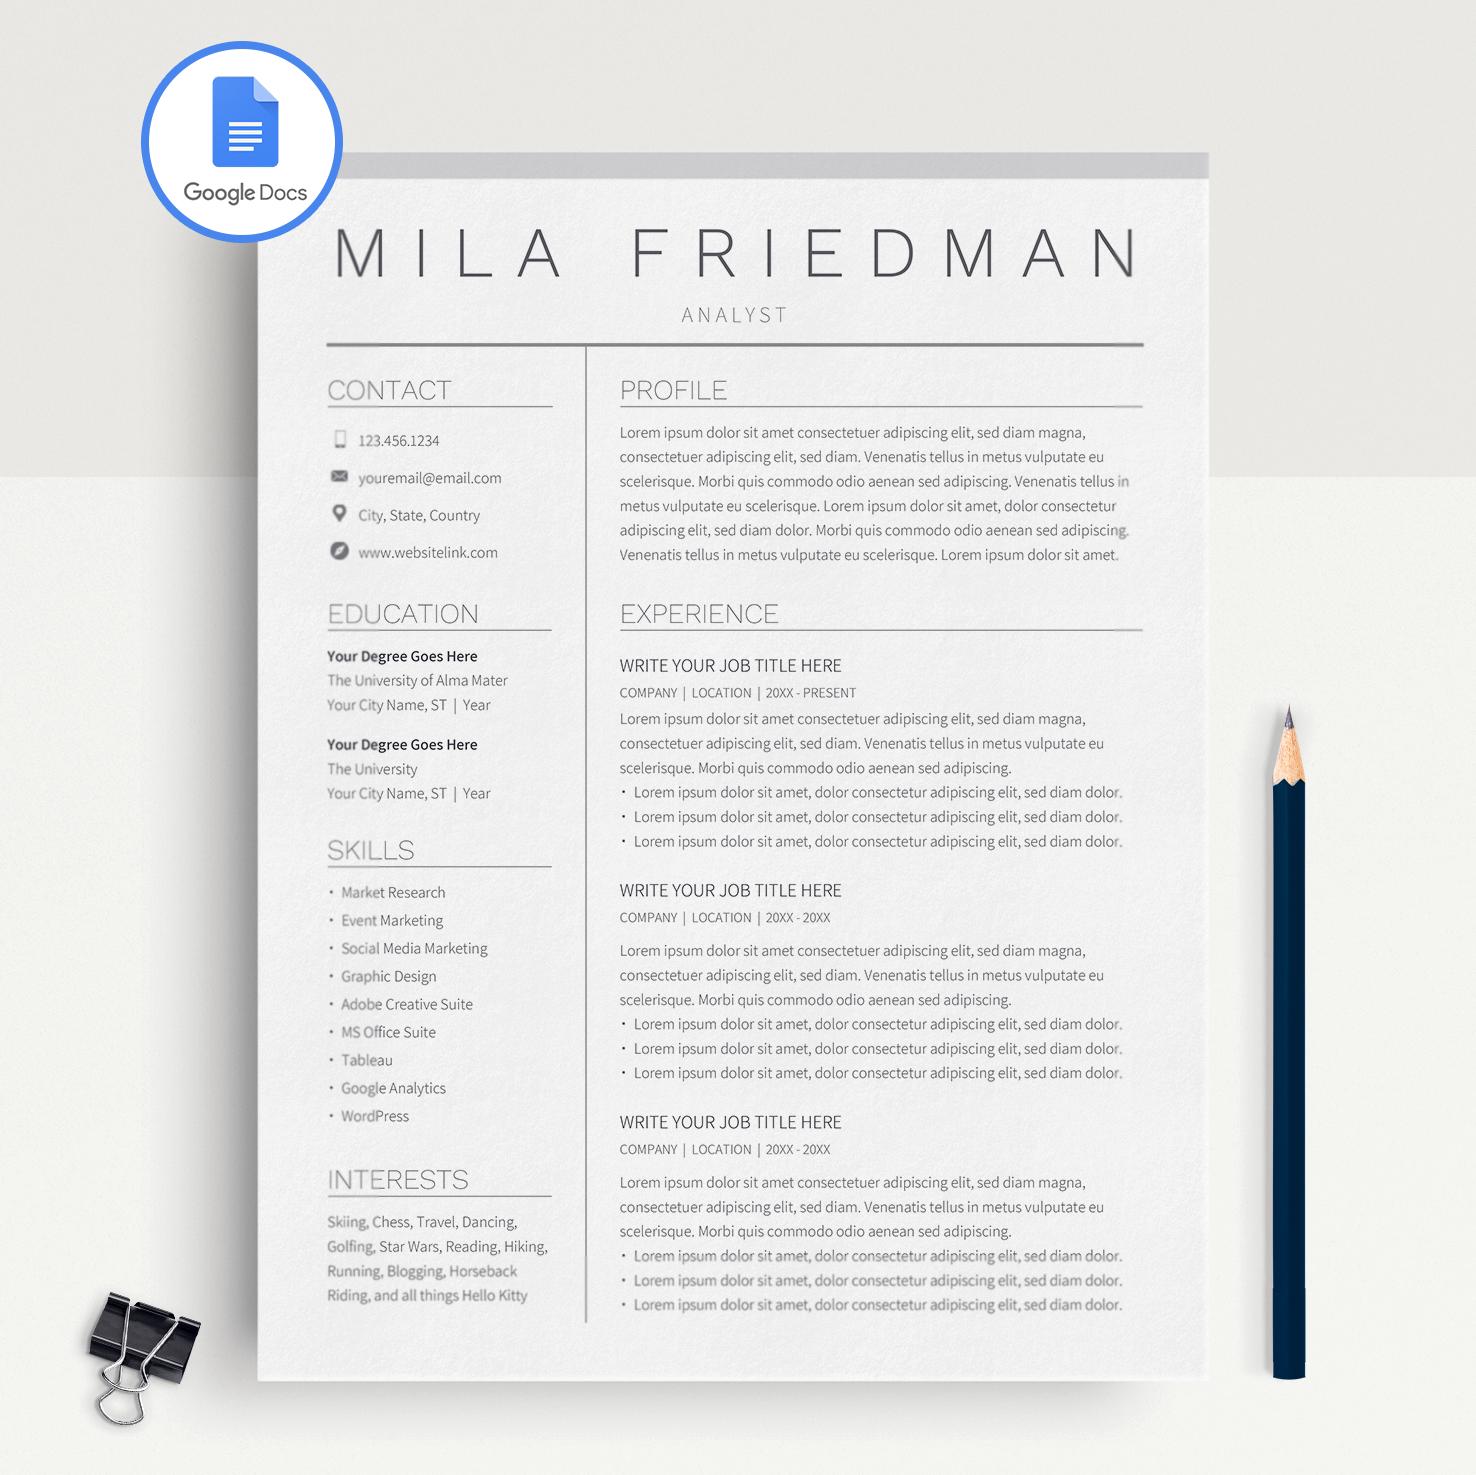 Google Docs Resume Template Cv Template Mila Friedman Miodocs Resume Templates Cv Template Resume Template